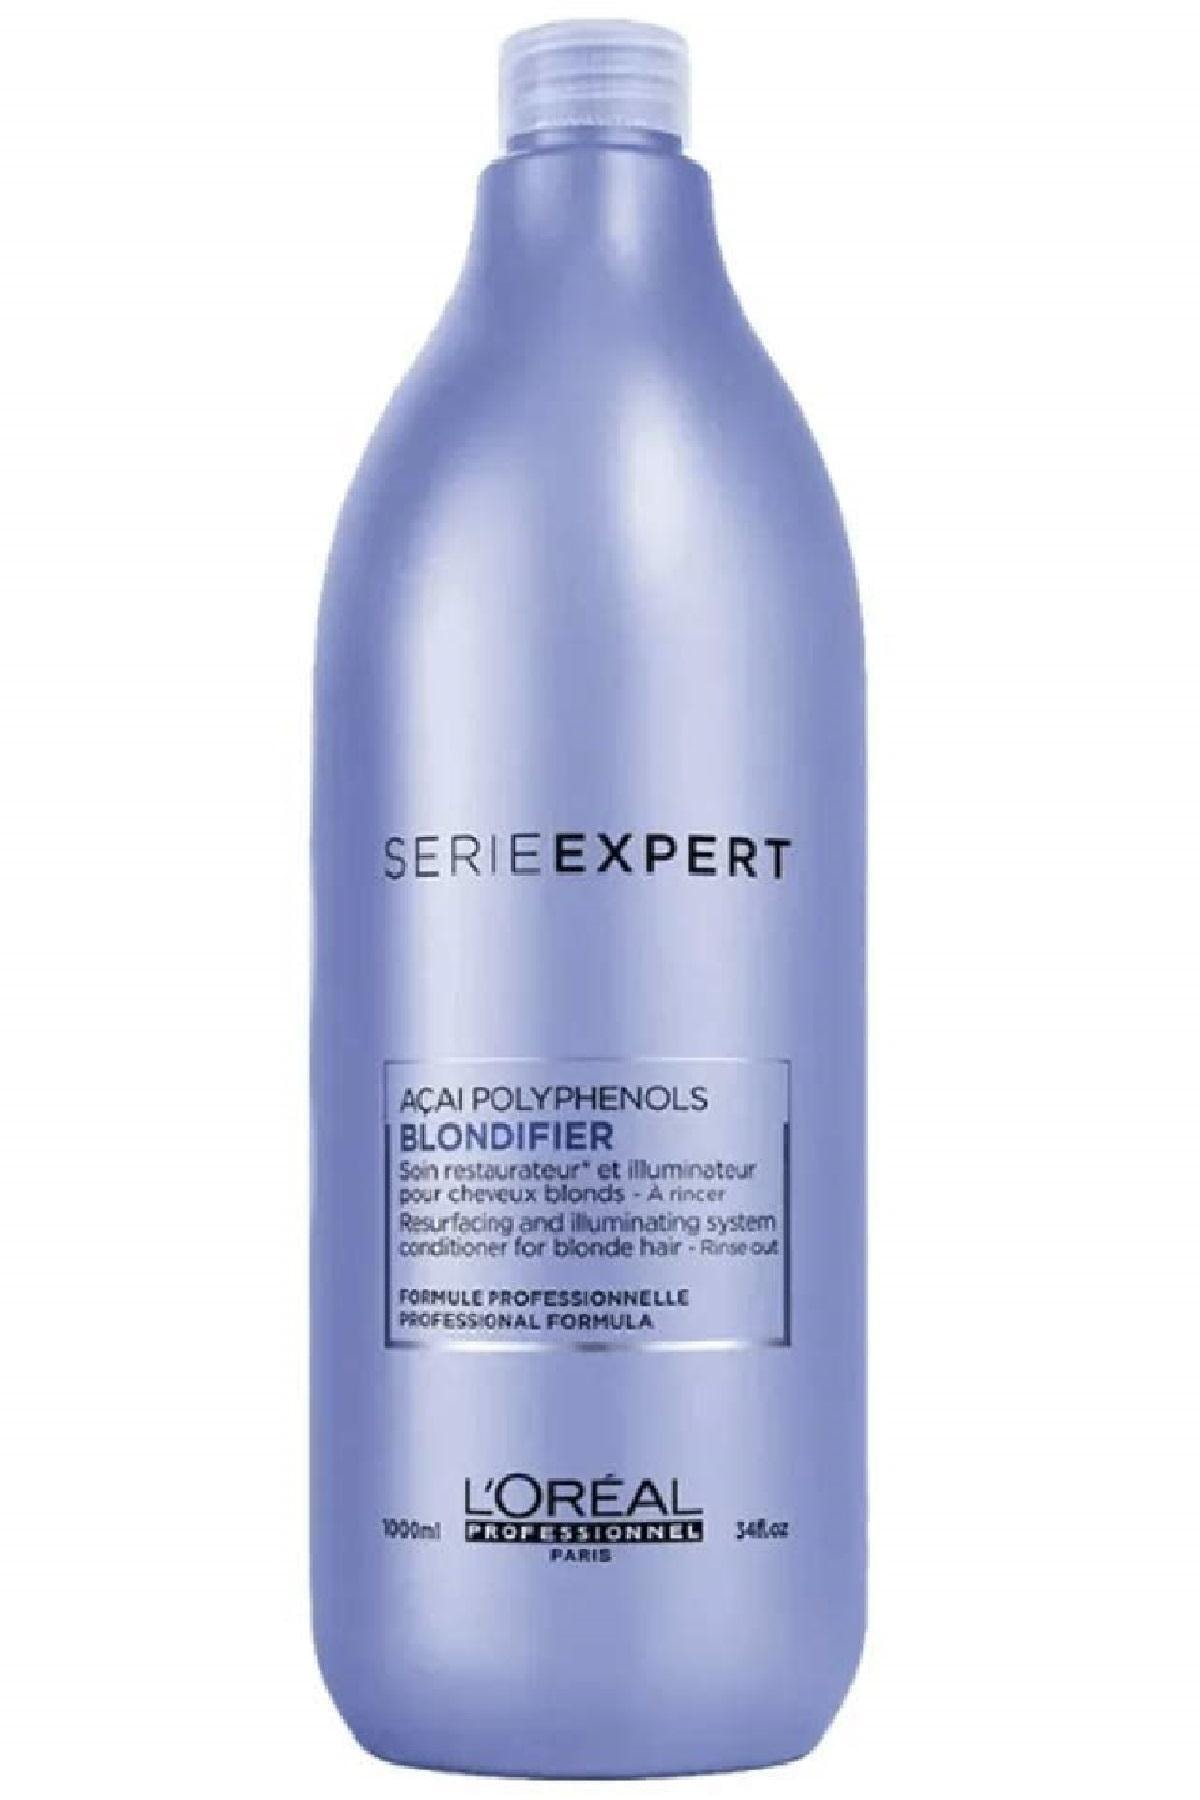 L'oreal Professionnel Loreal Serie Expert Blondifier Saç Kremi 1000ml 1